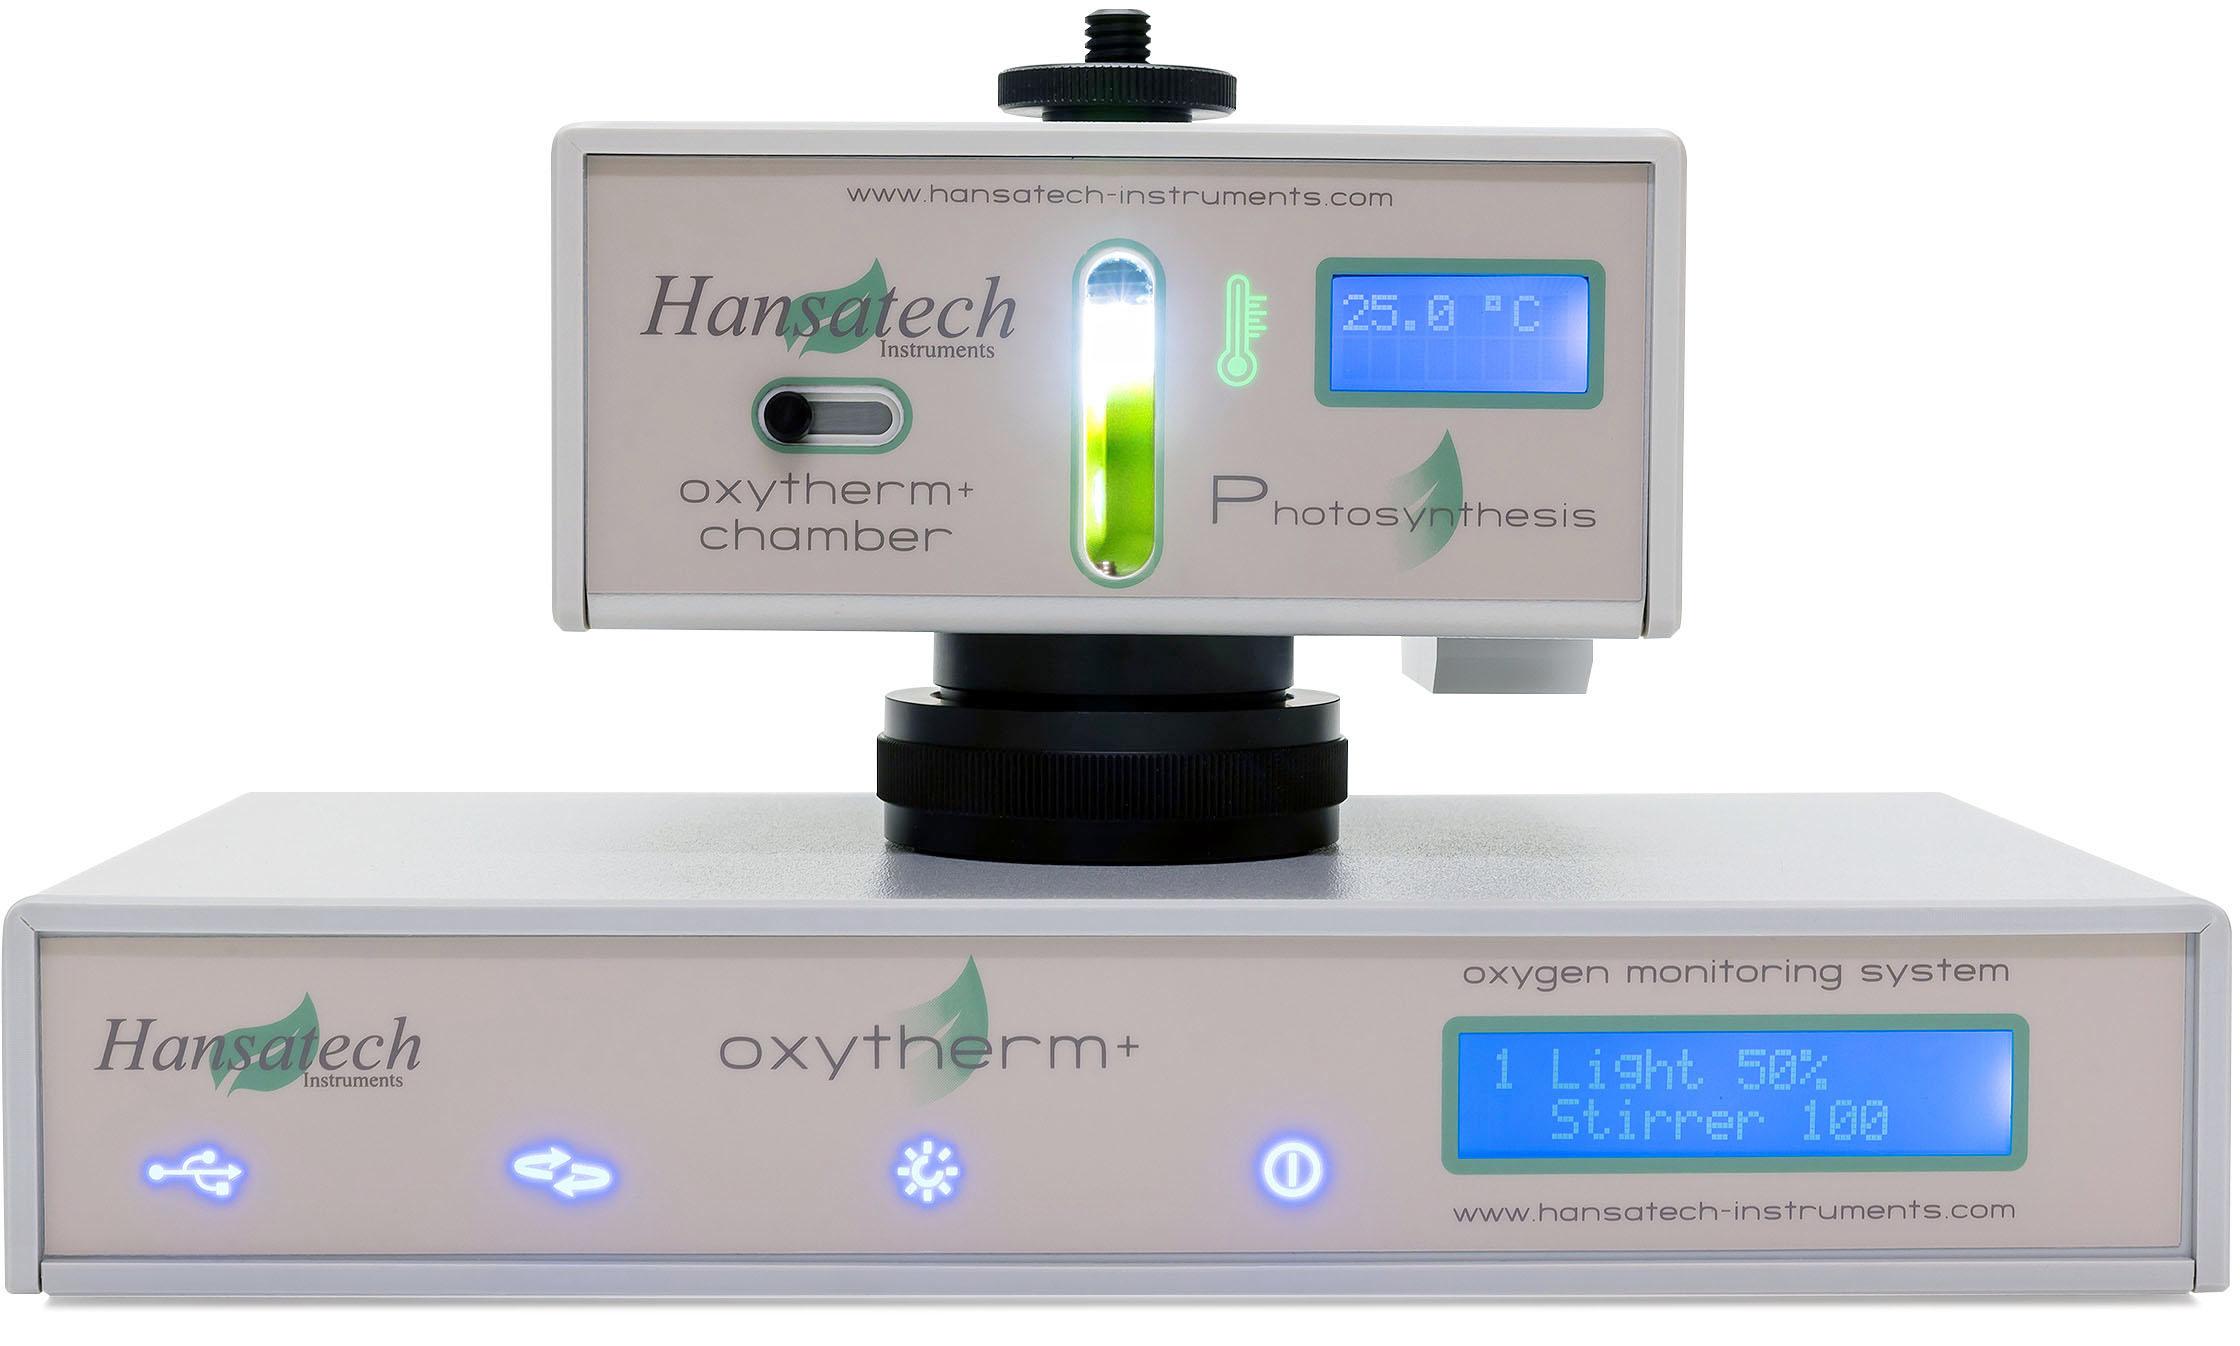 Oxytherm+ P